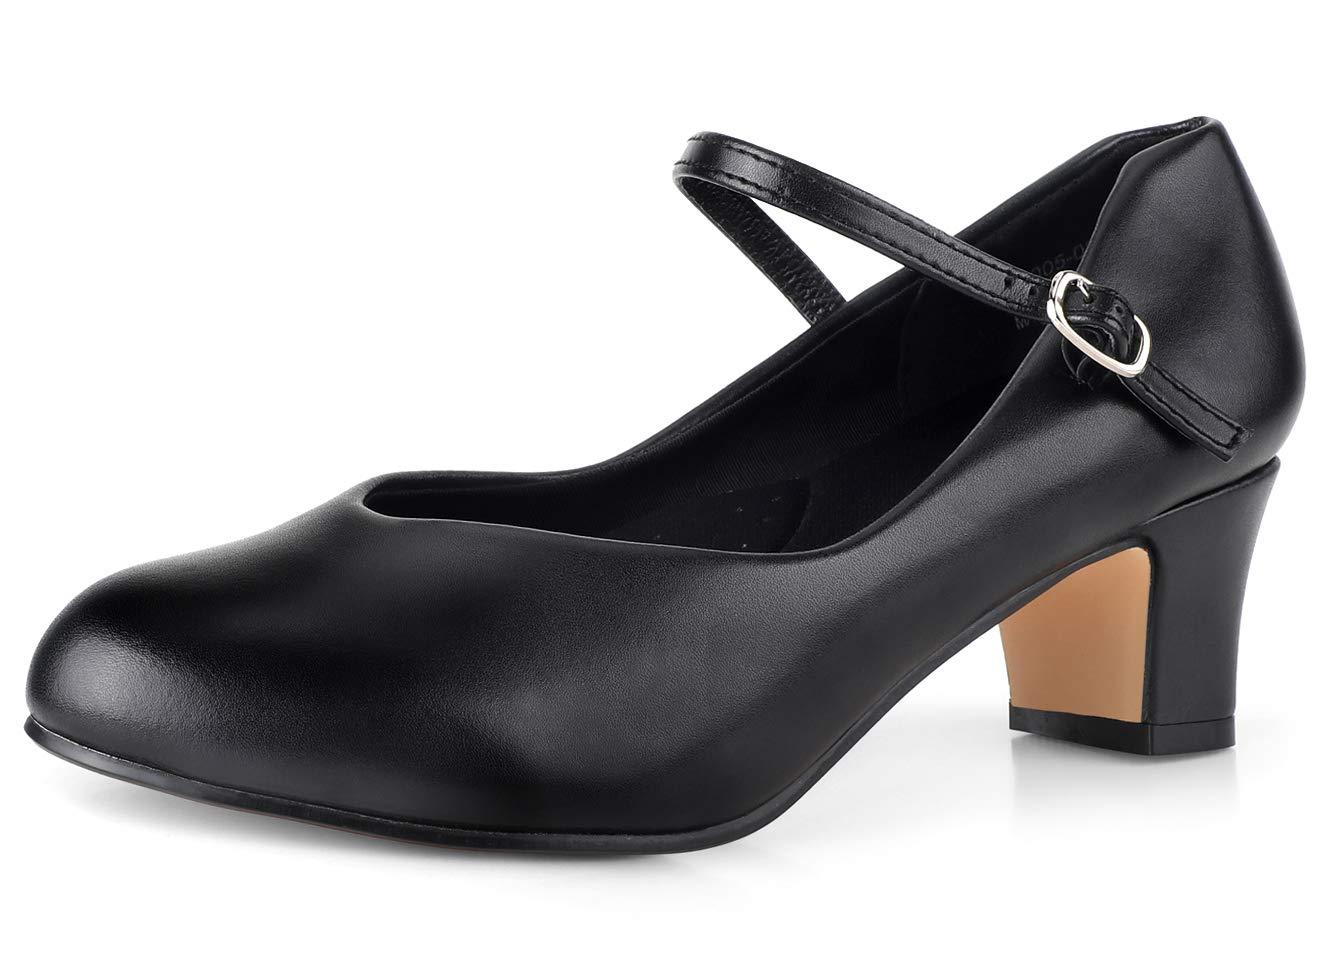 "SKOEX Character Shoes for Women 2"" Heel Black/Tan"